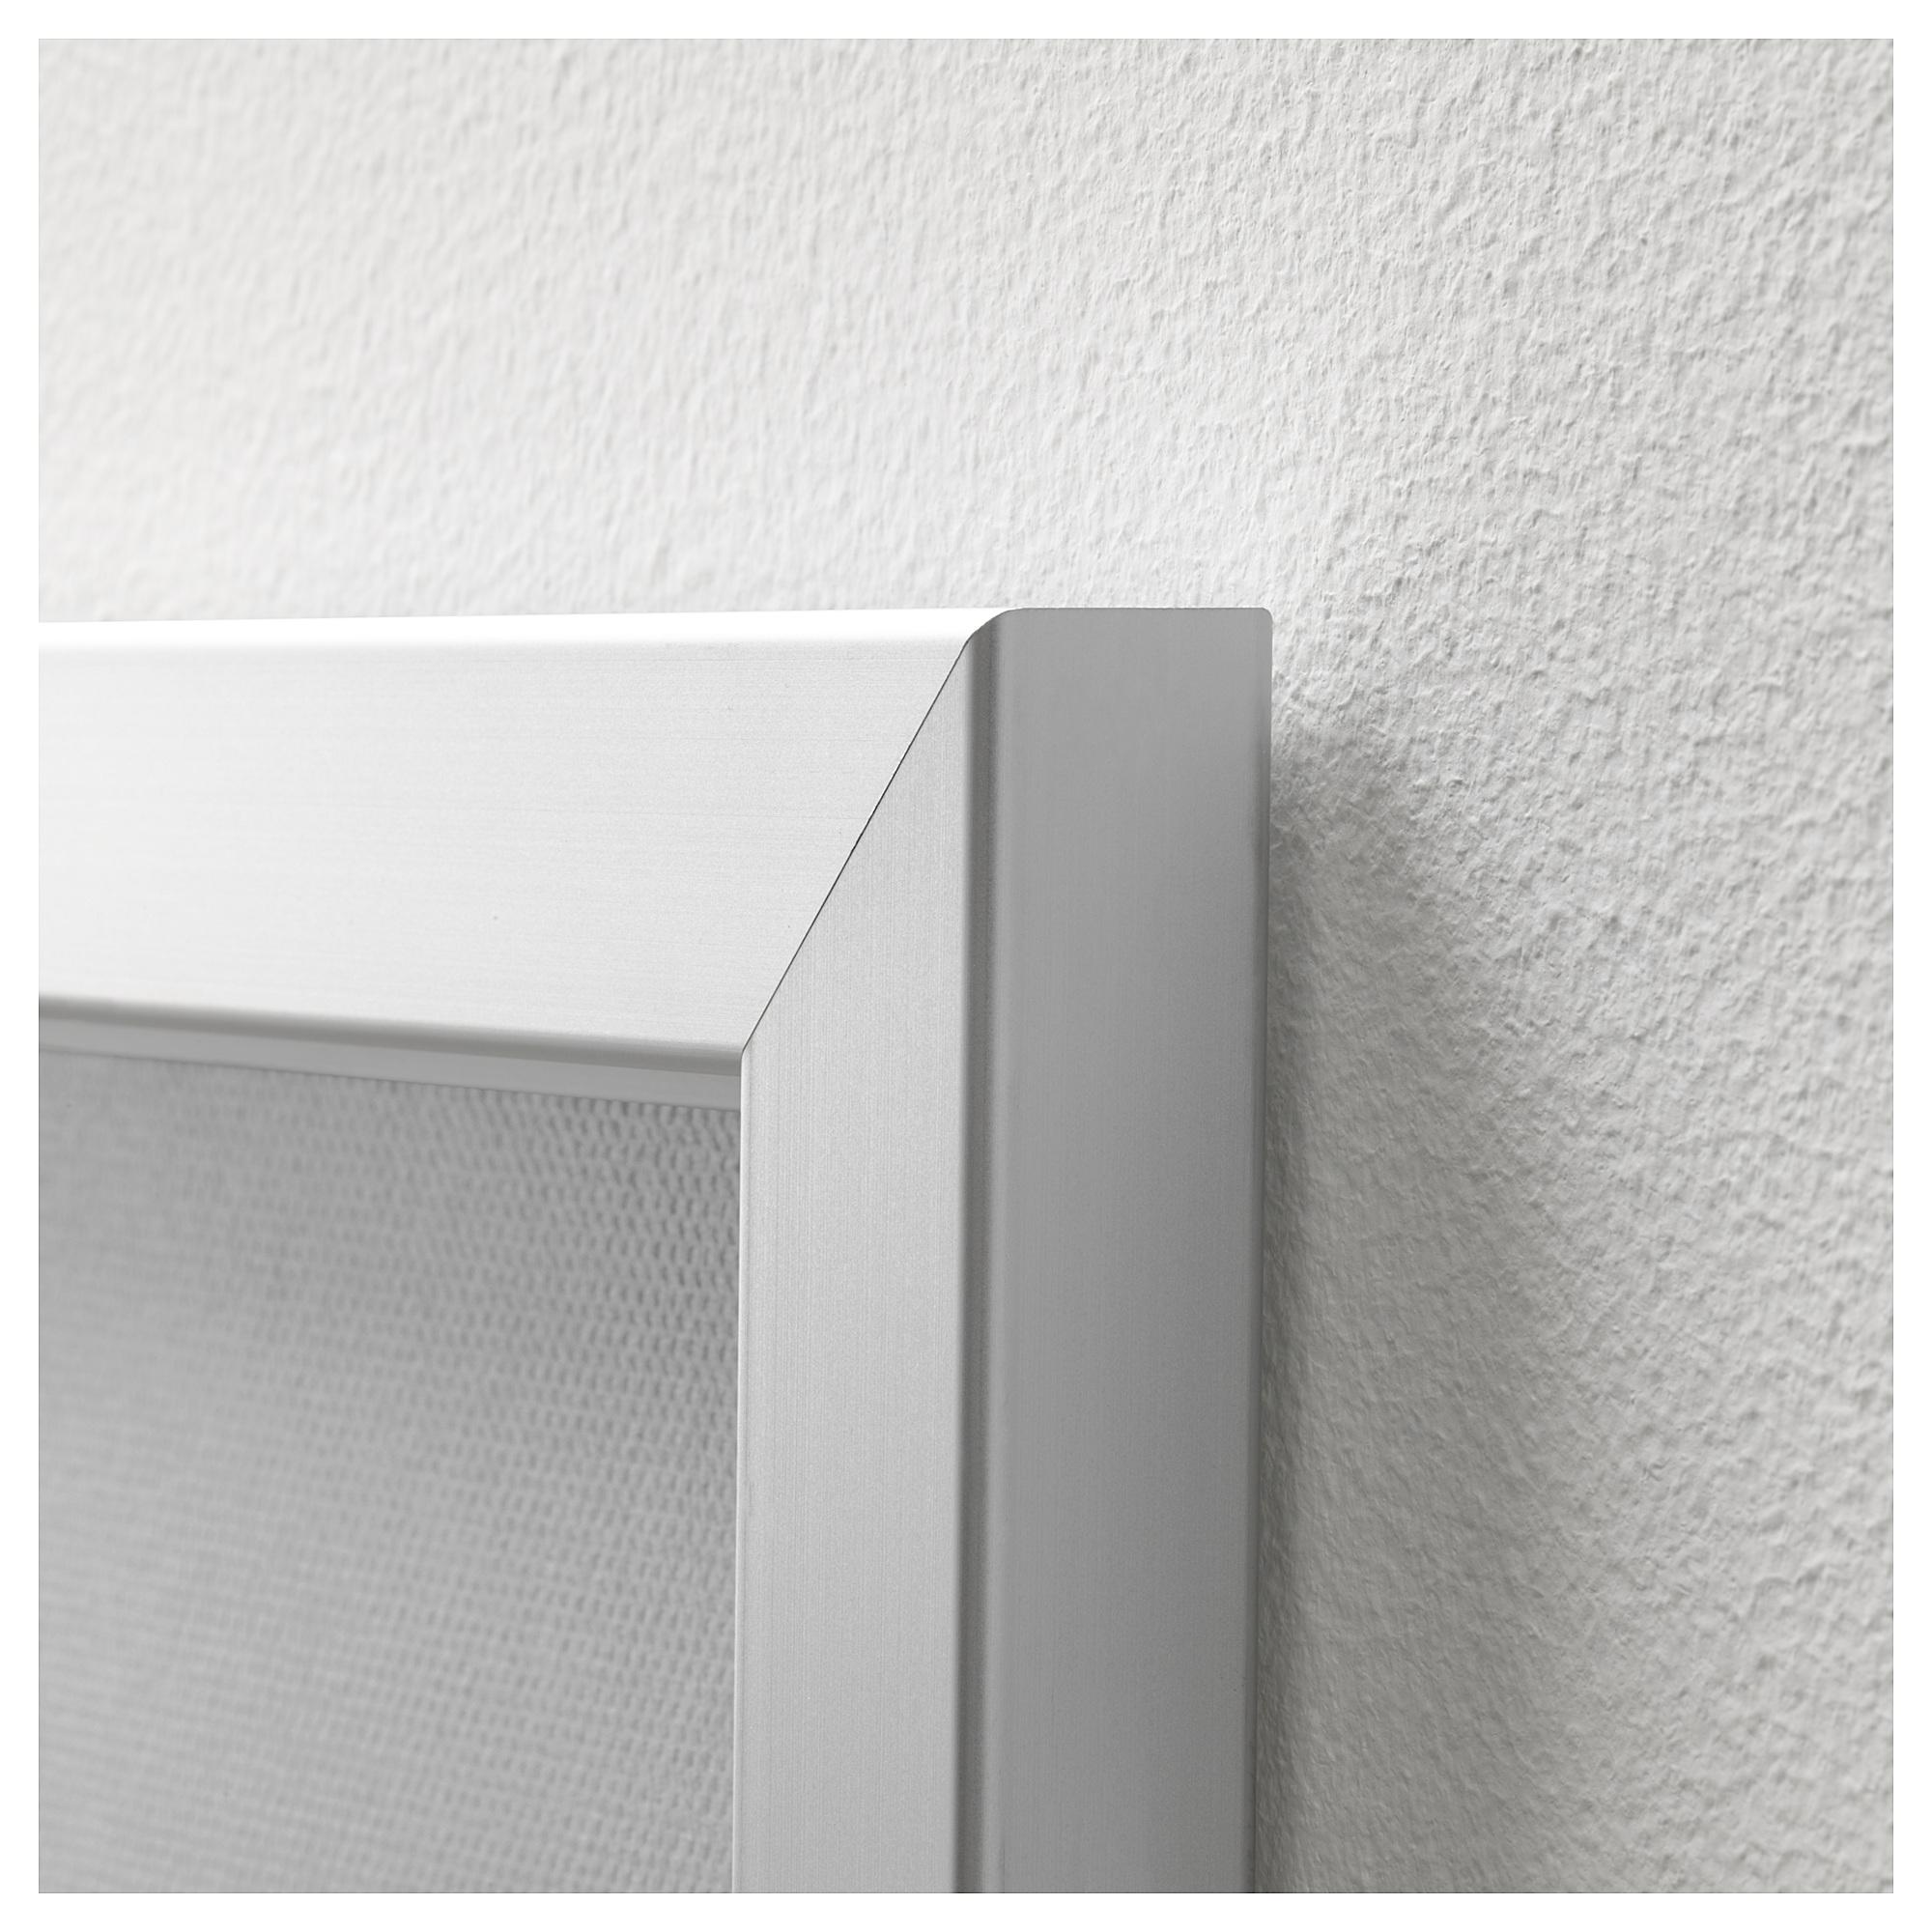 Картина с рамой БЬЁРКСТА цвет алюминия артикуль № 392.475.57 в наличии. Онлайн каталог IKEA РБ. Быстрая доставка и соборка.